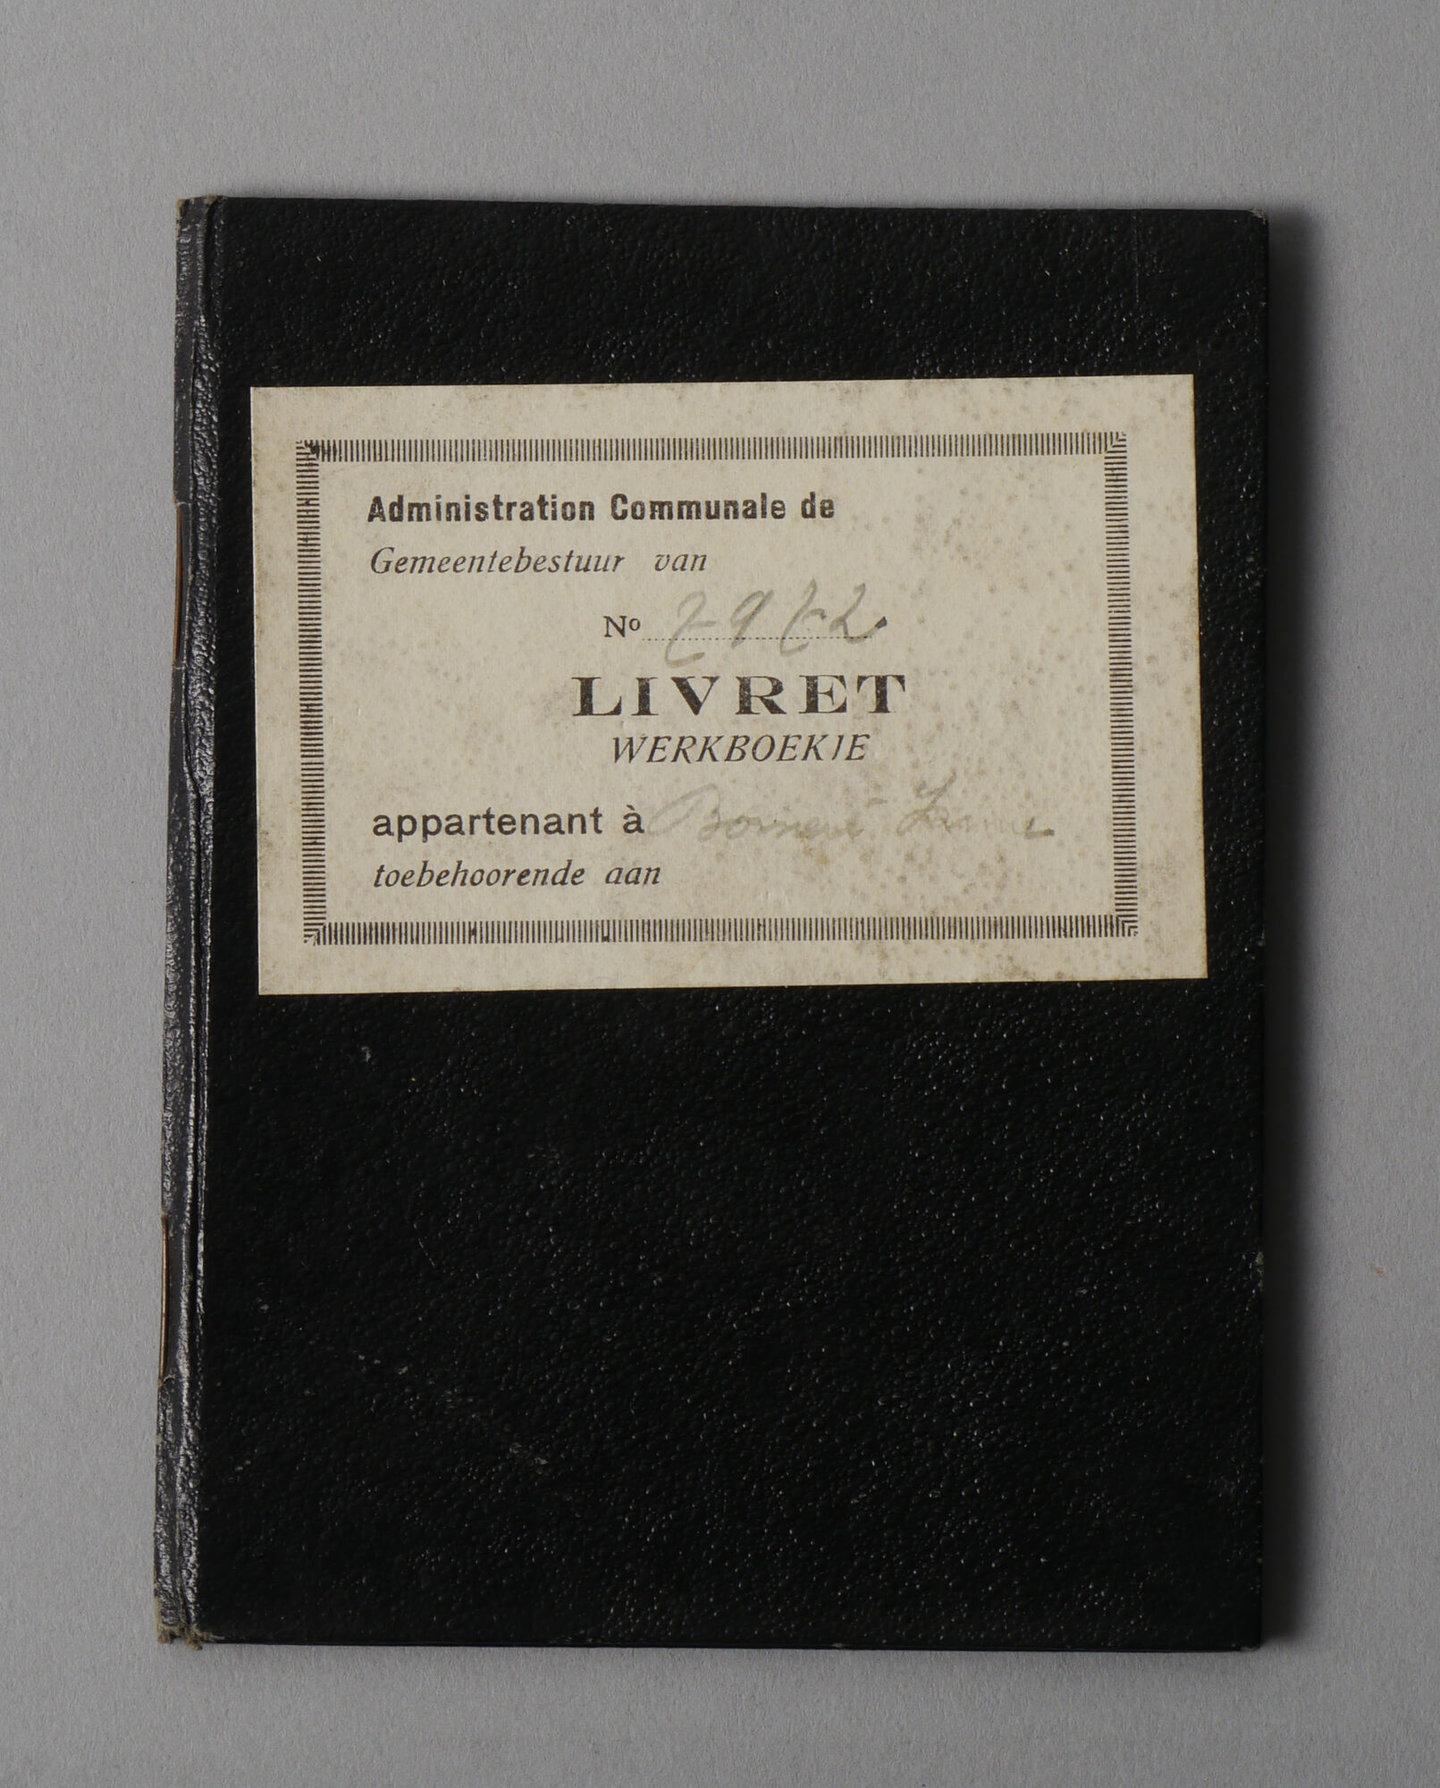 Werkboekje van Irma Adrienne Bomeré